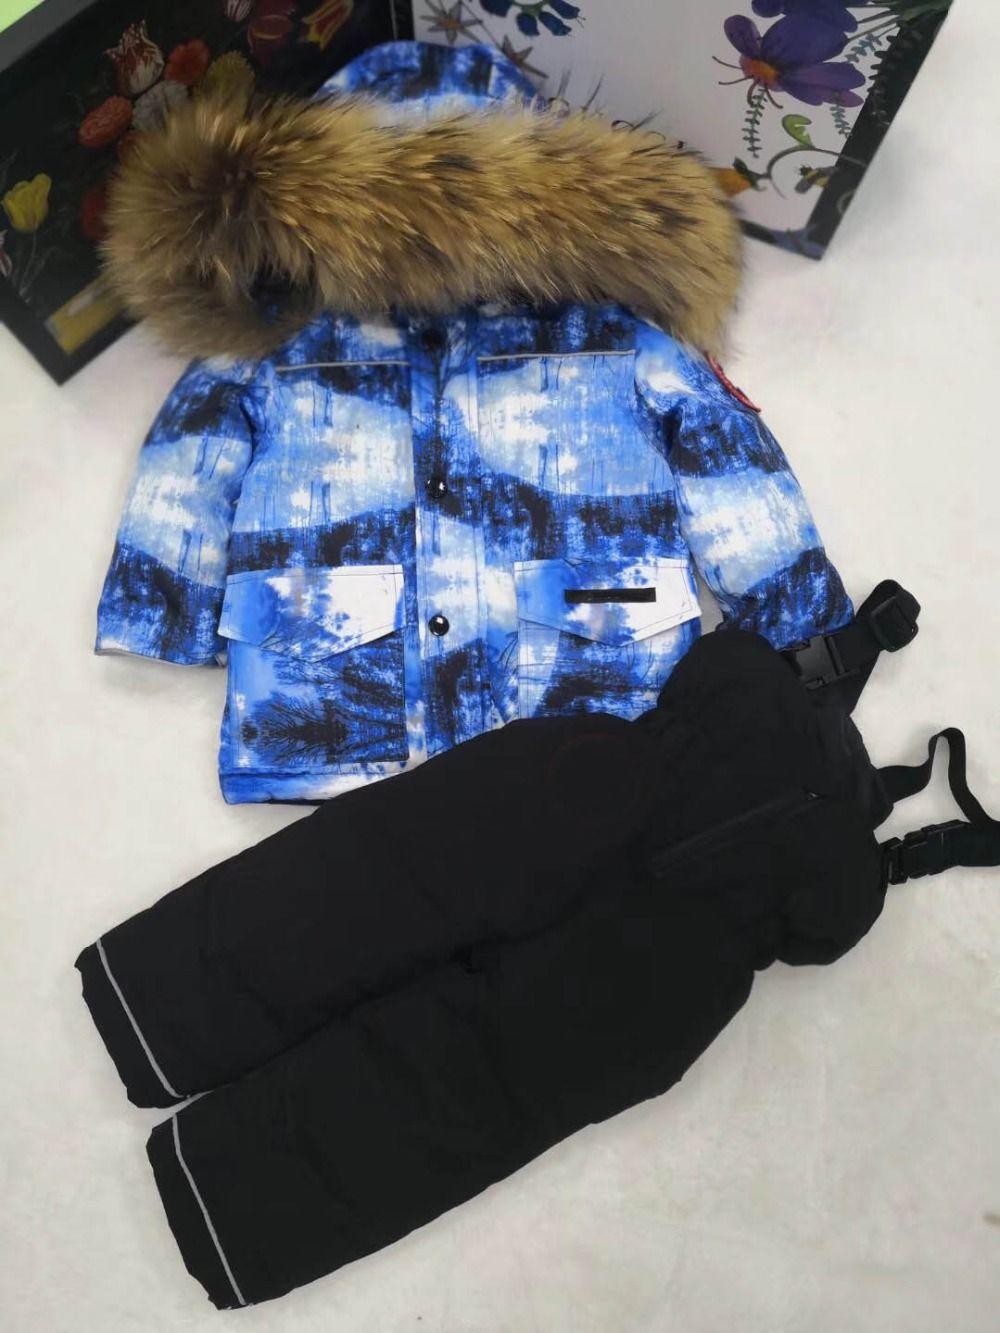 2018 Children Snowsuits Outdoor Windproof Waterproof Kids Sets Boys Girls Ski Suit Winter down sets kids clothing 85-145 cm